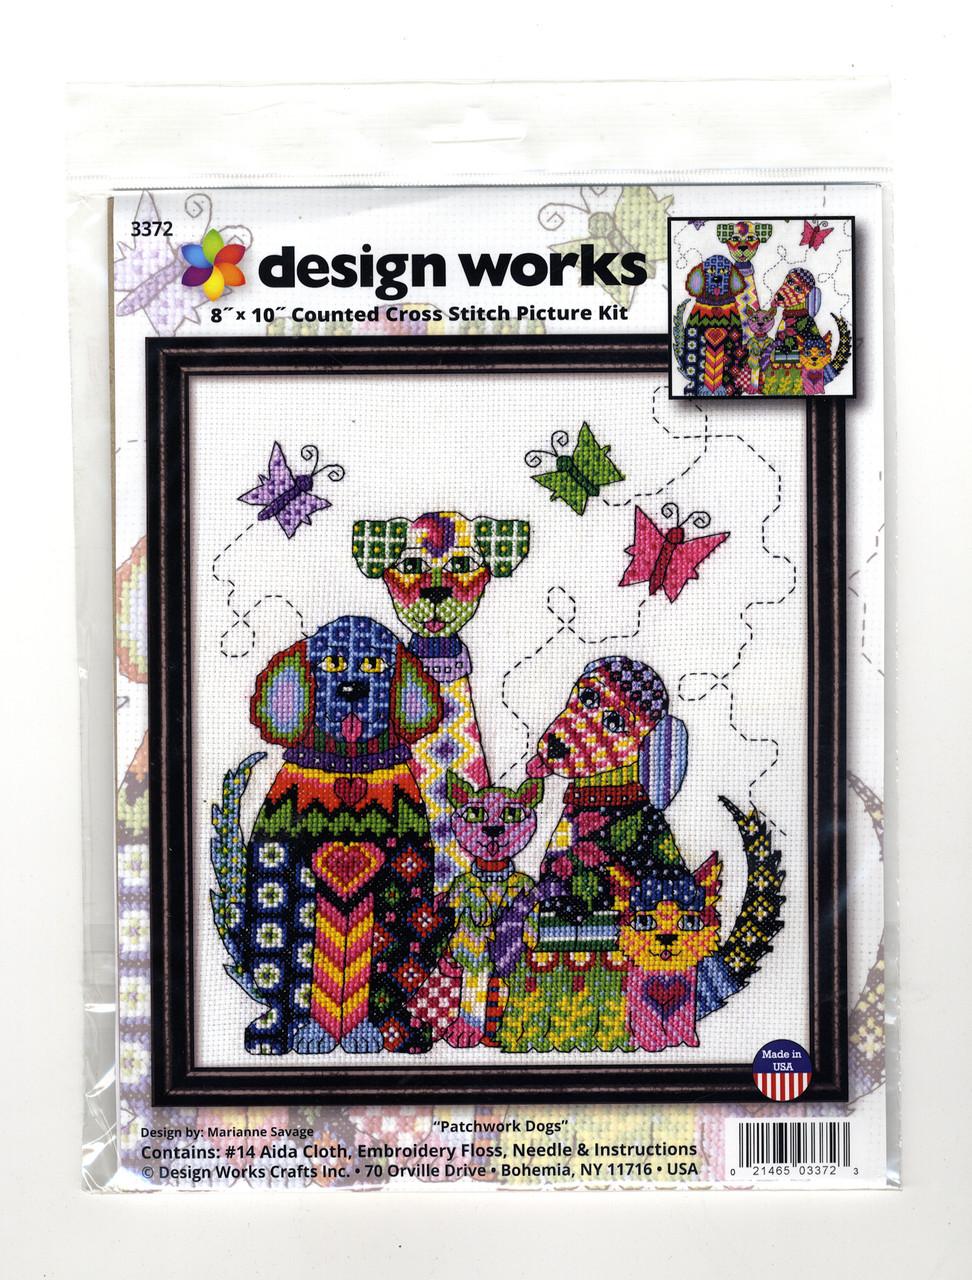 Design Works - Patchwork Dogs